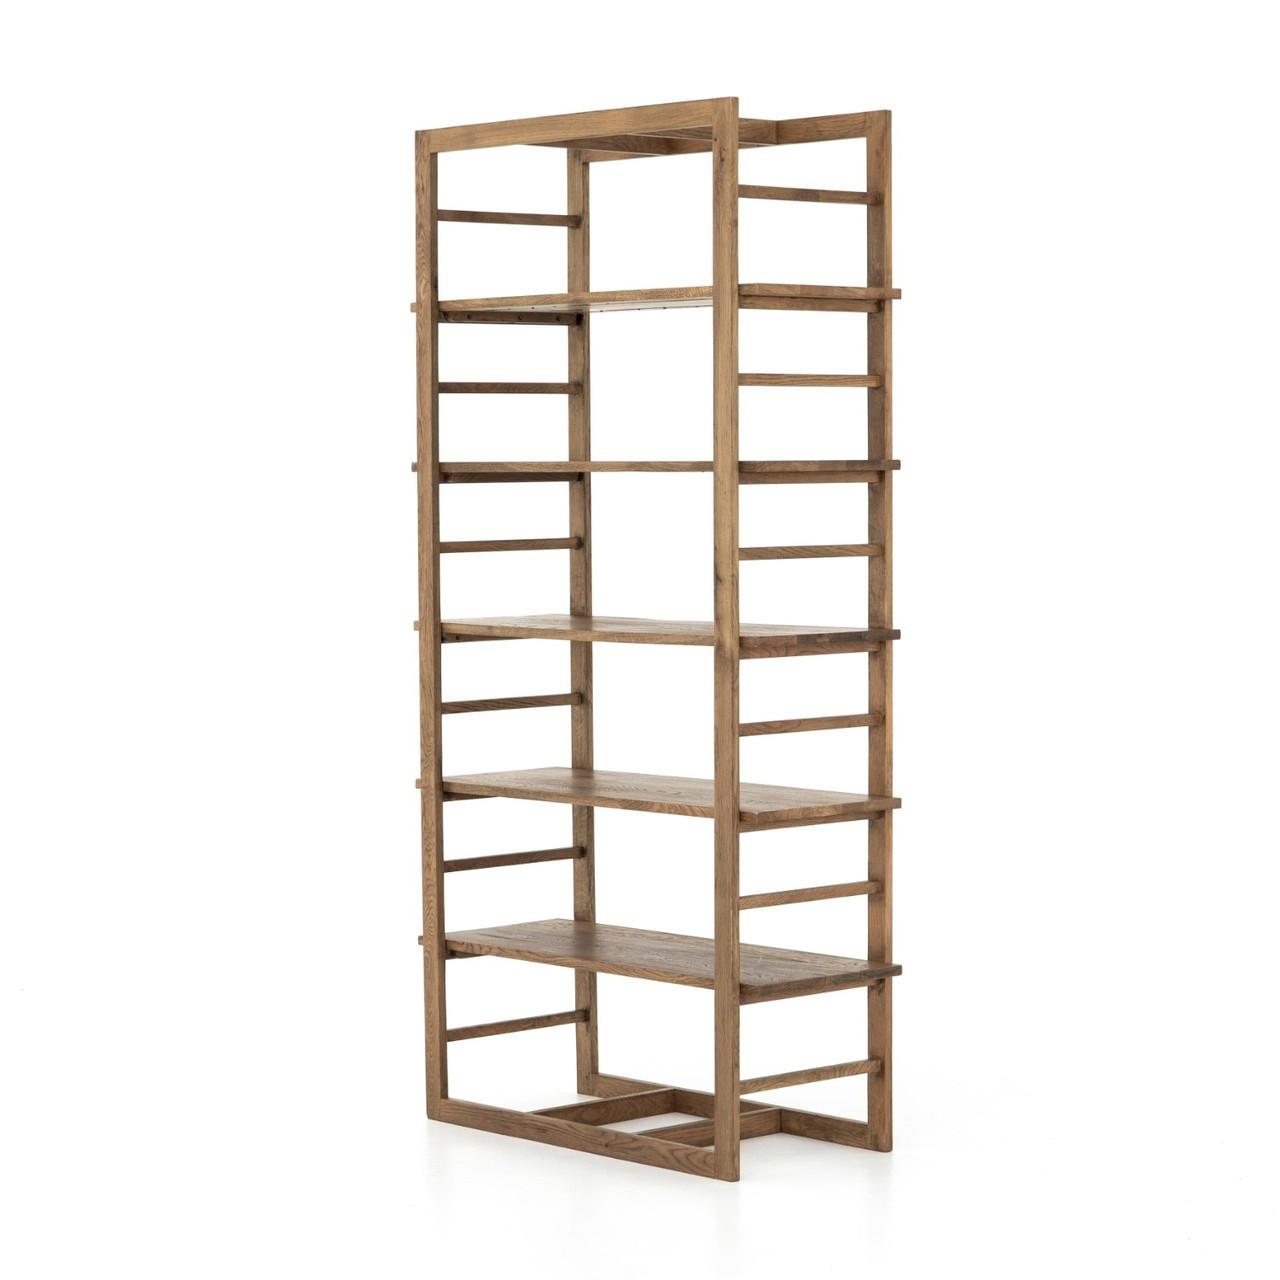 Mack Contemporary Oak Wood Bookshelf